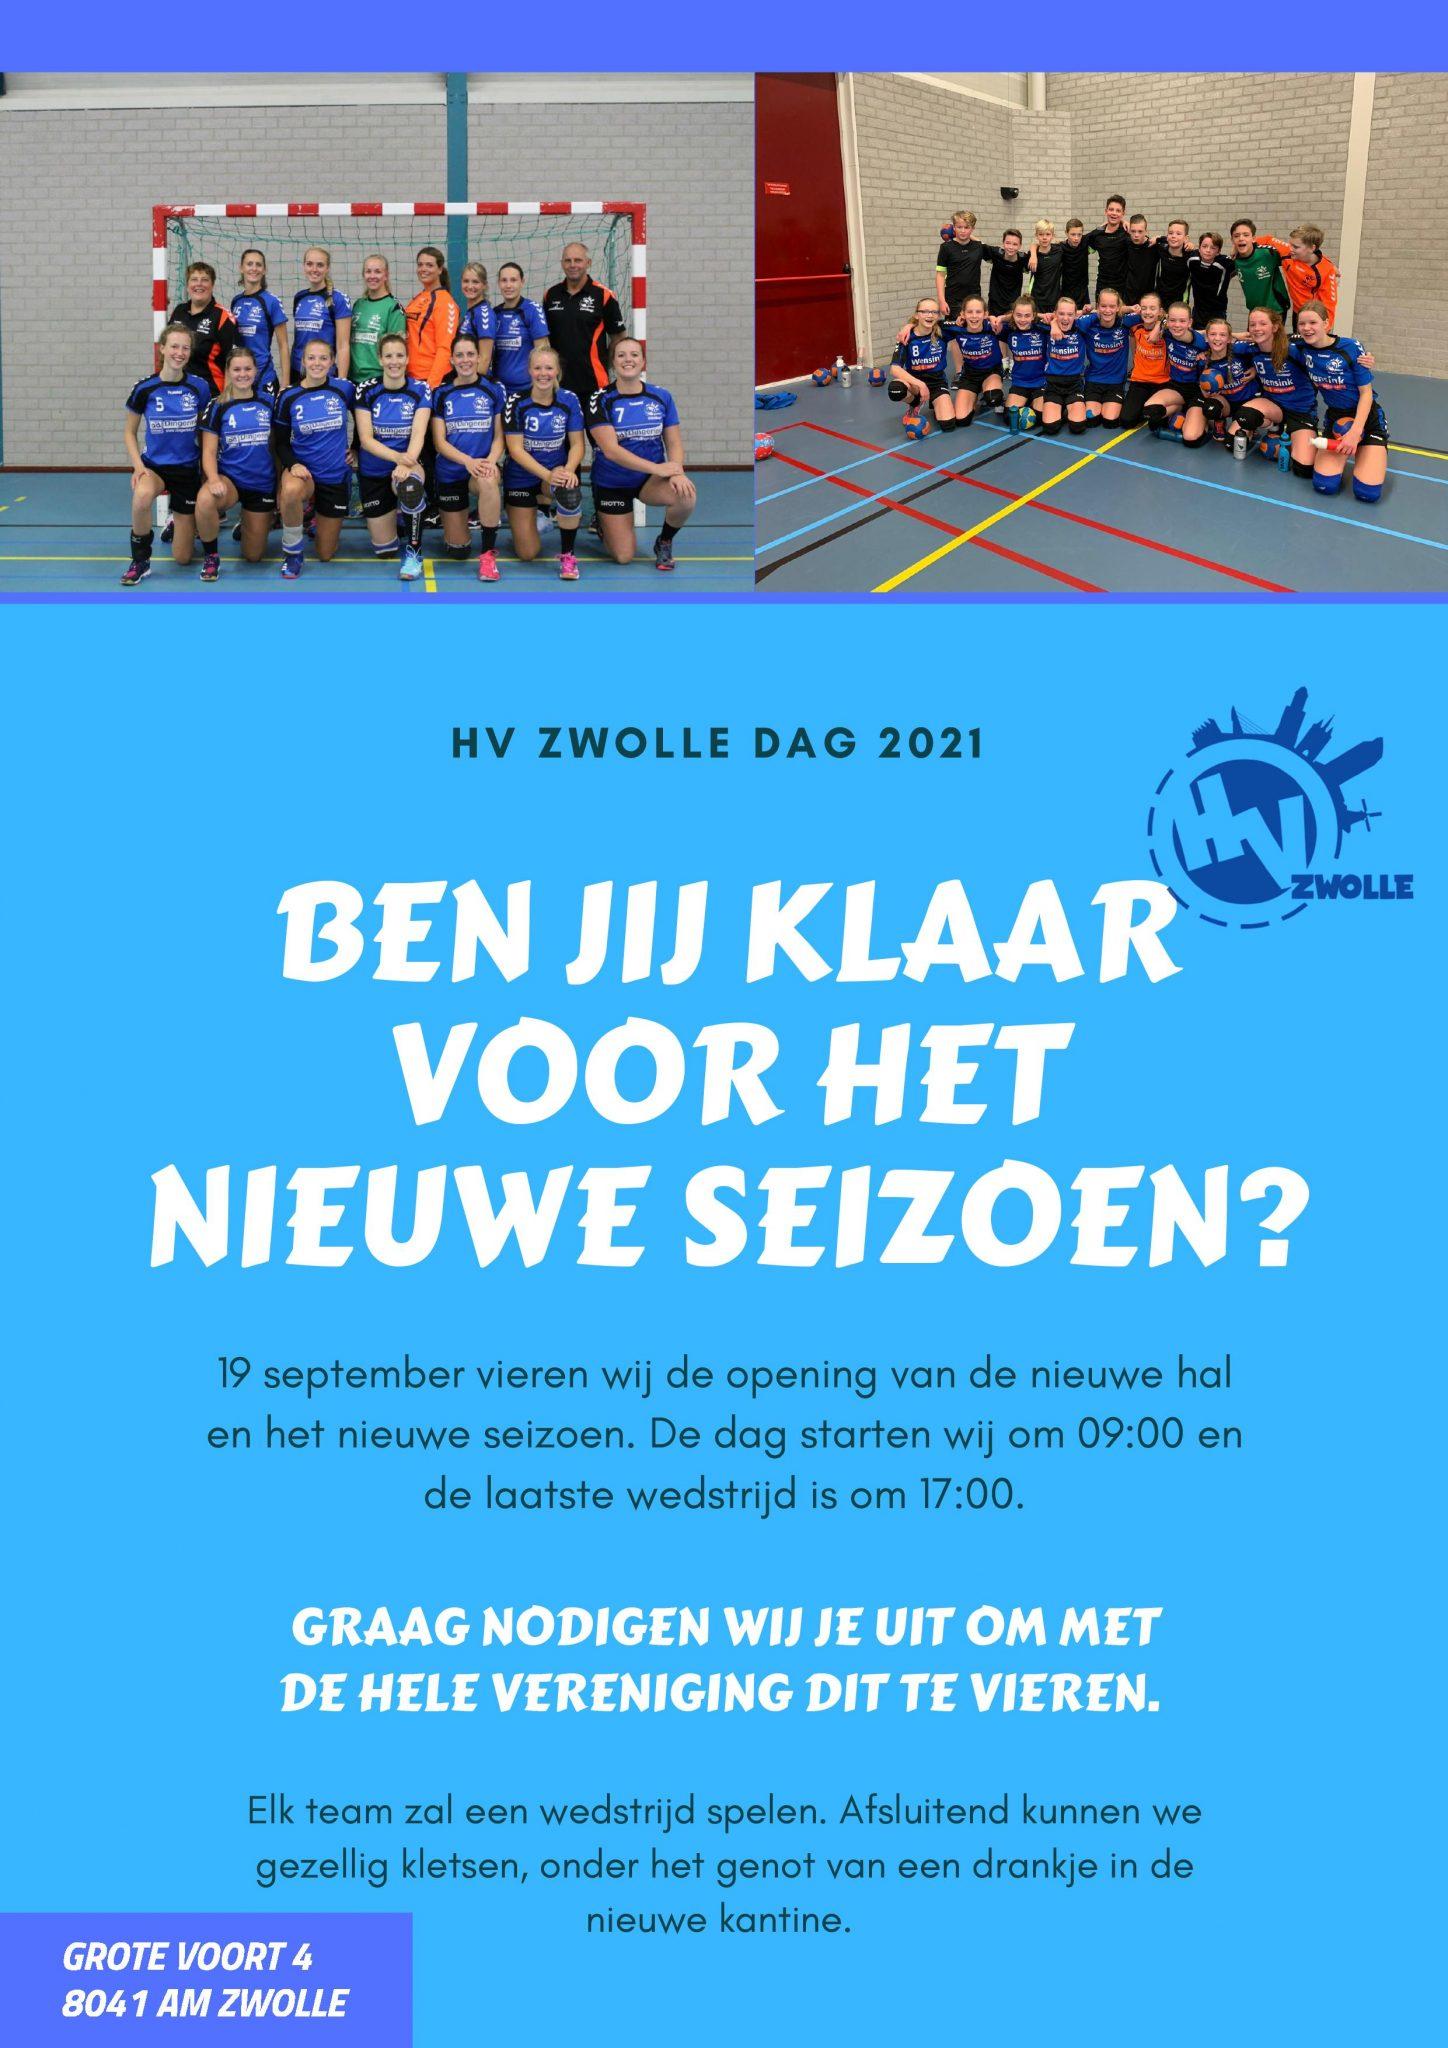 Zwolledag 2021